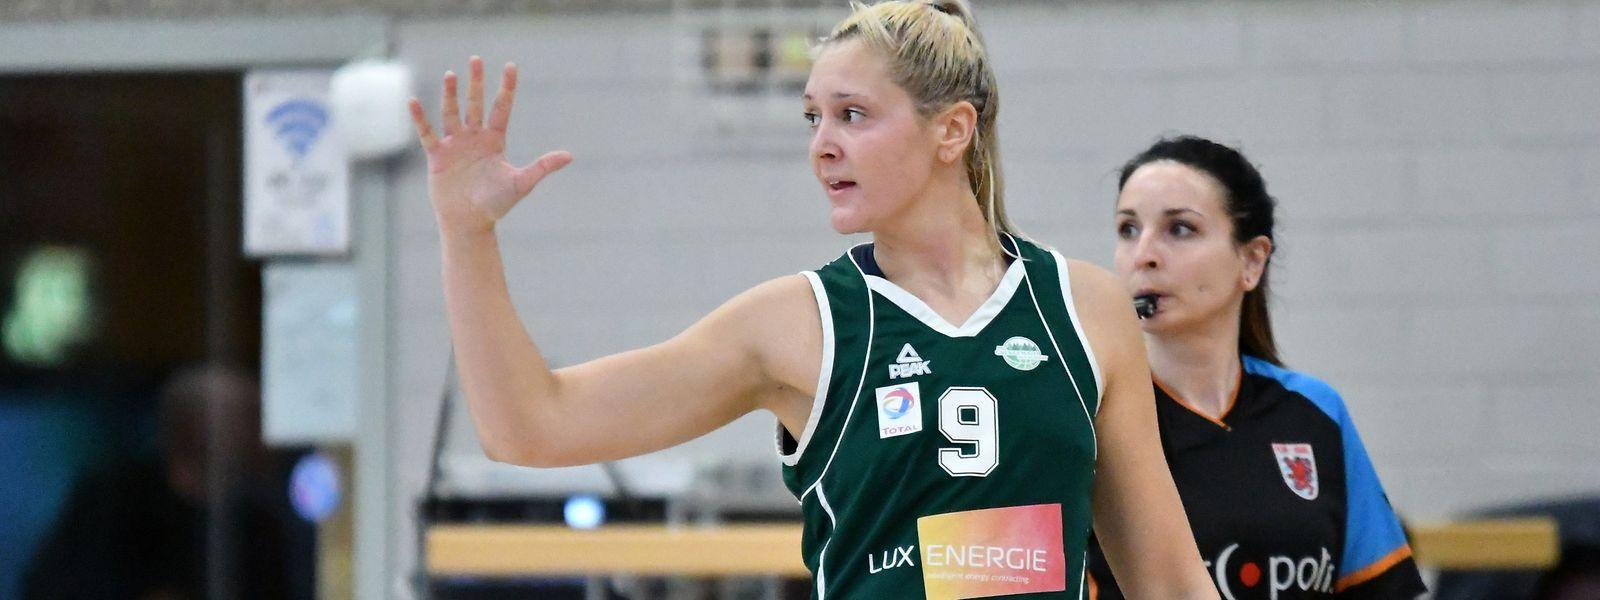 Alexandra Louin steht mit Gréngewald im Finale.